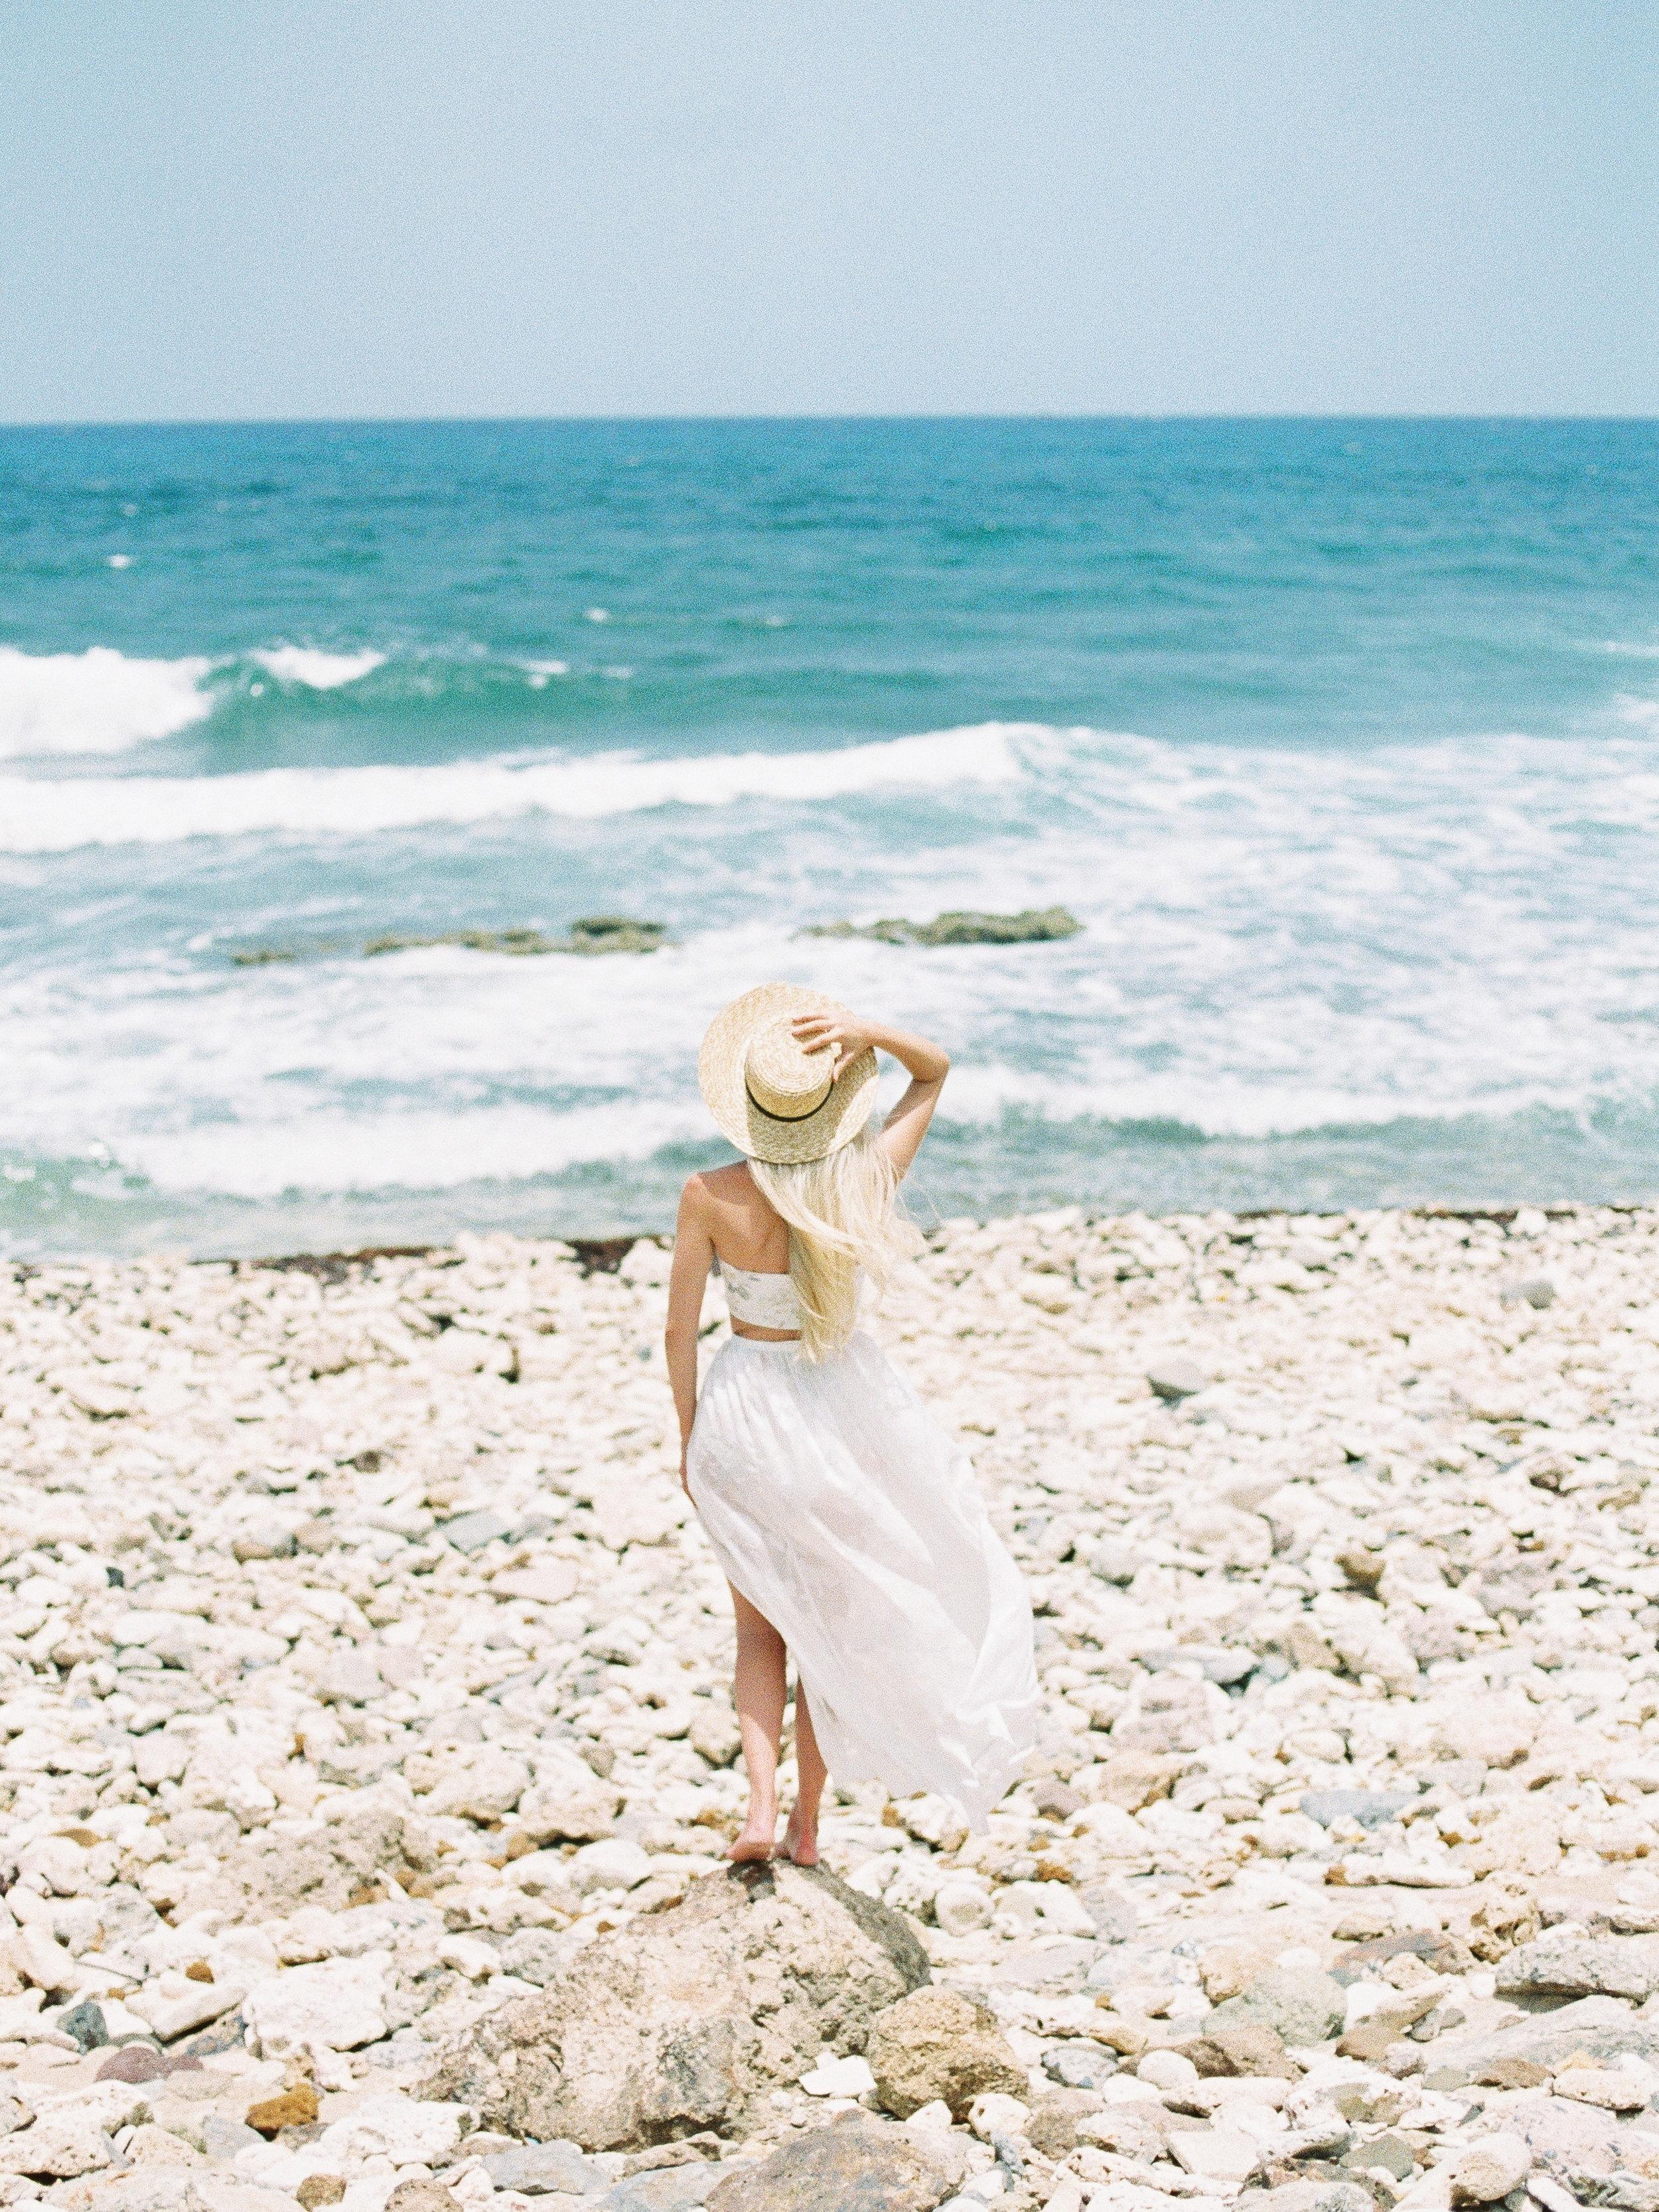 St. Barth's Vacation Travel Blog - Rachel Owens Photography -29.jpg